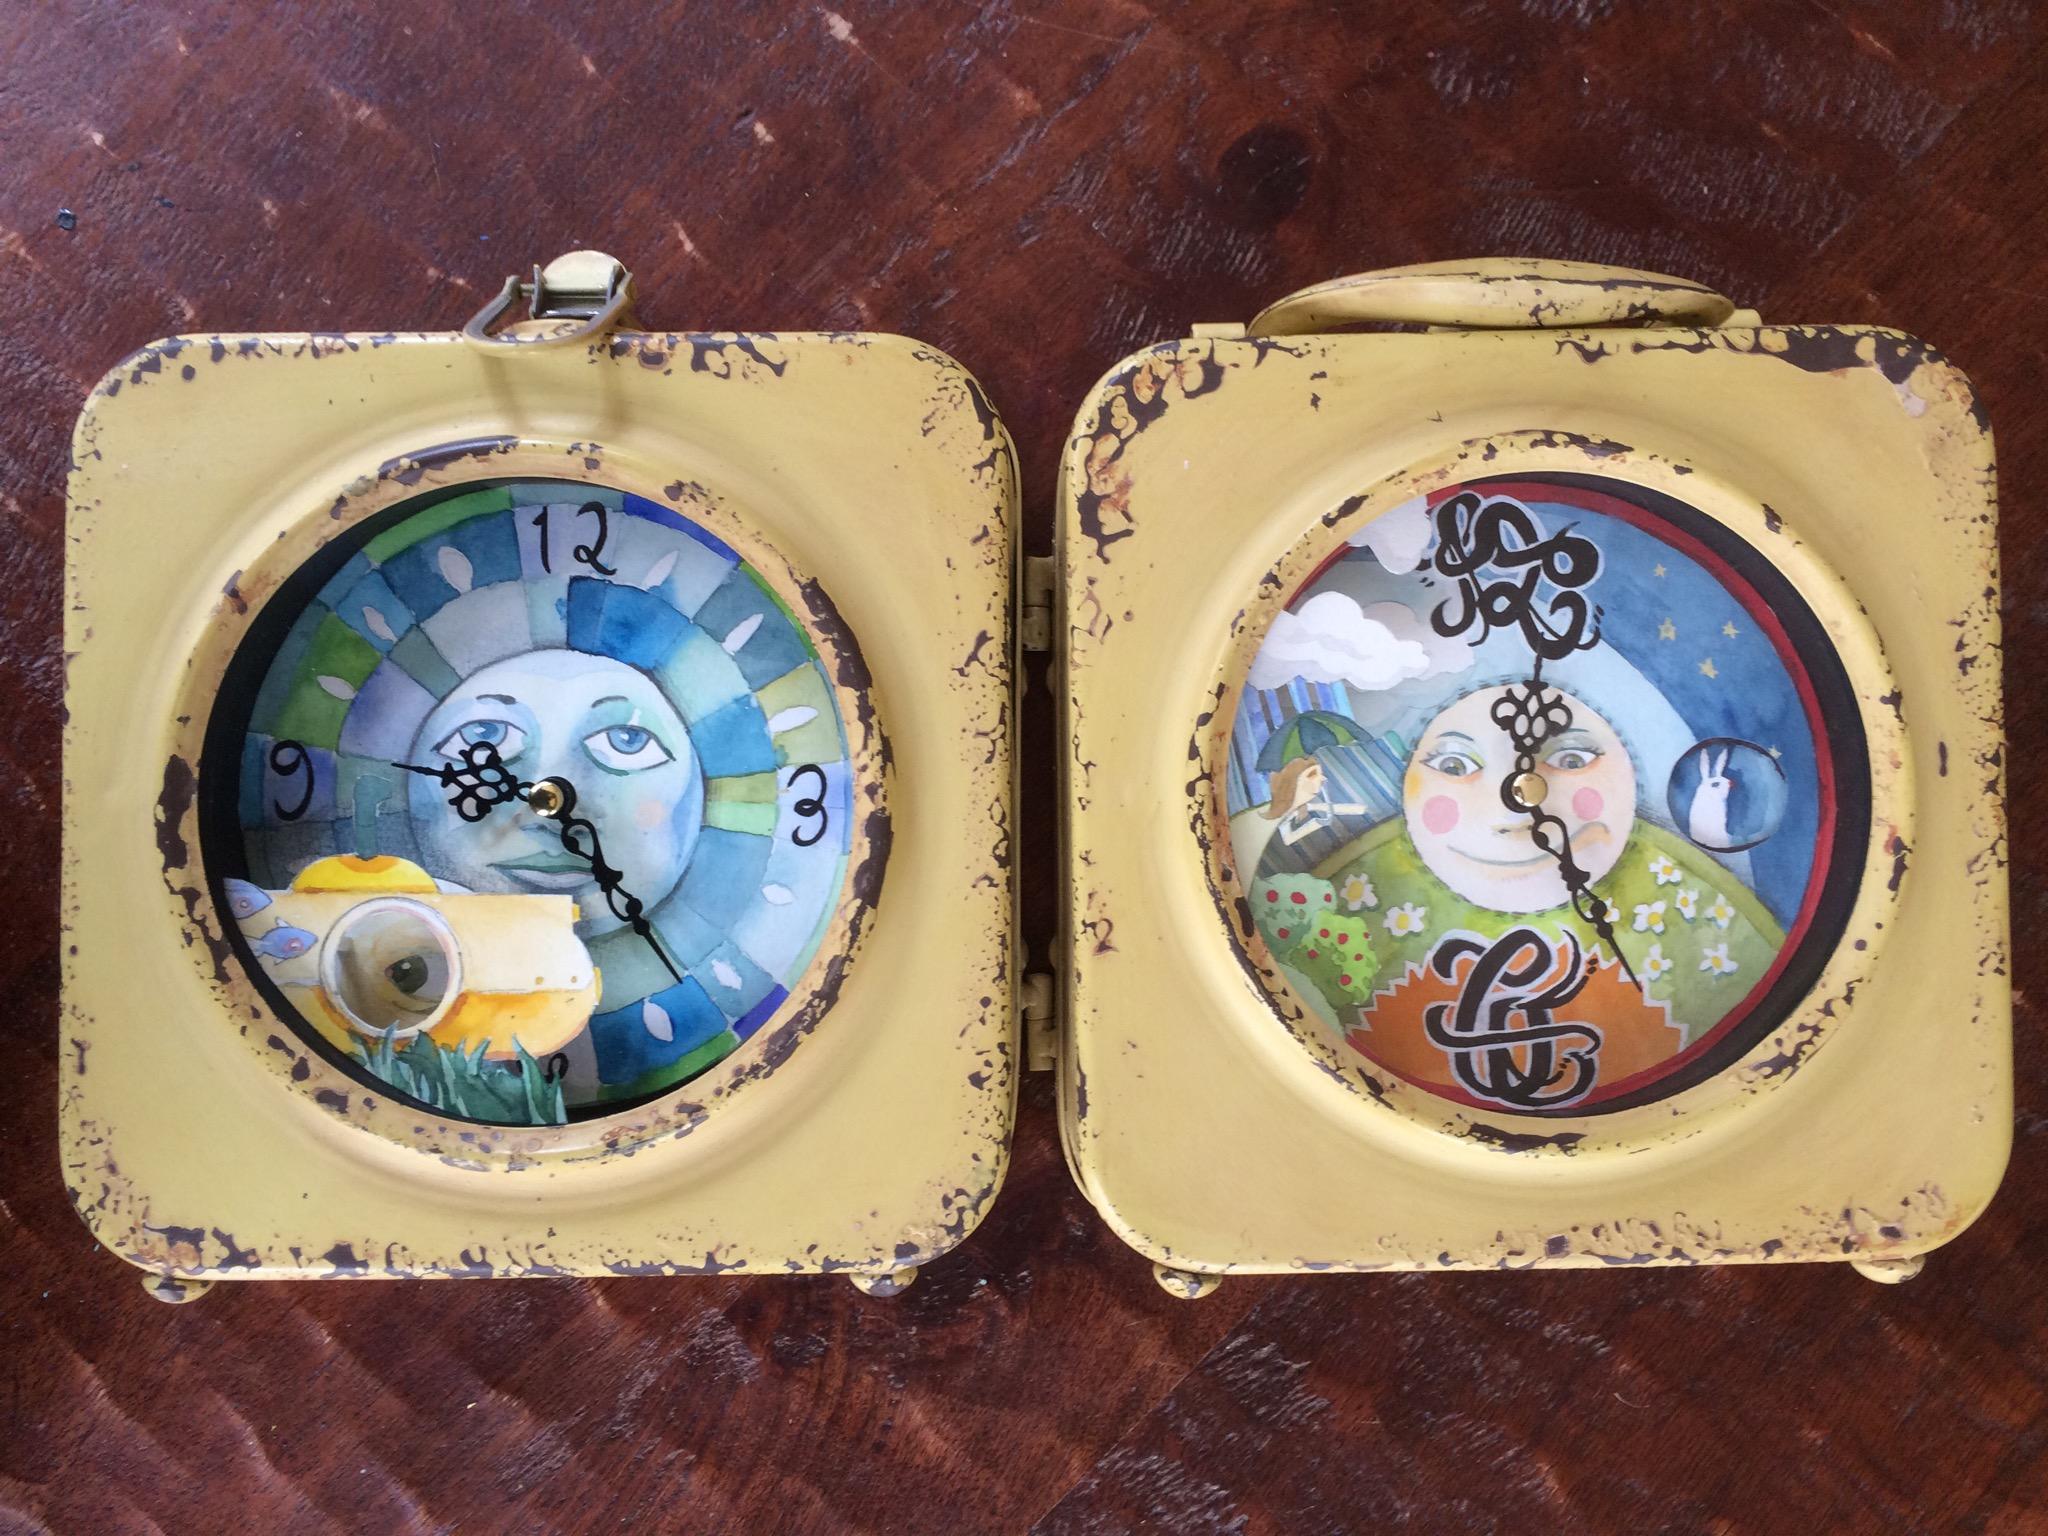 Clock? A new coast to coast lunchbox style clock.